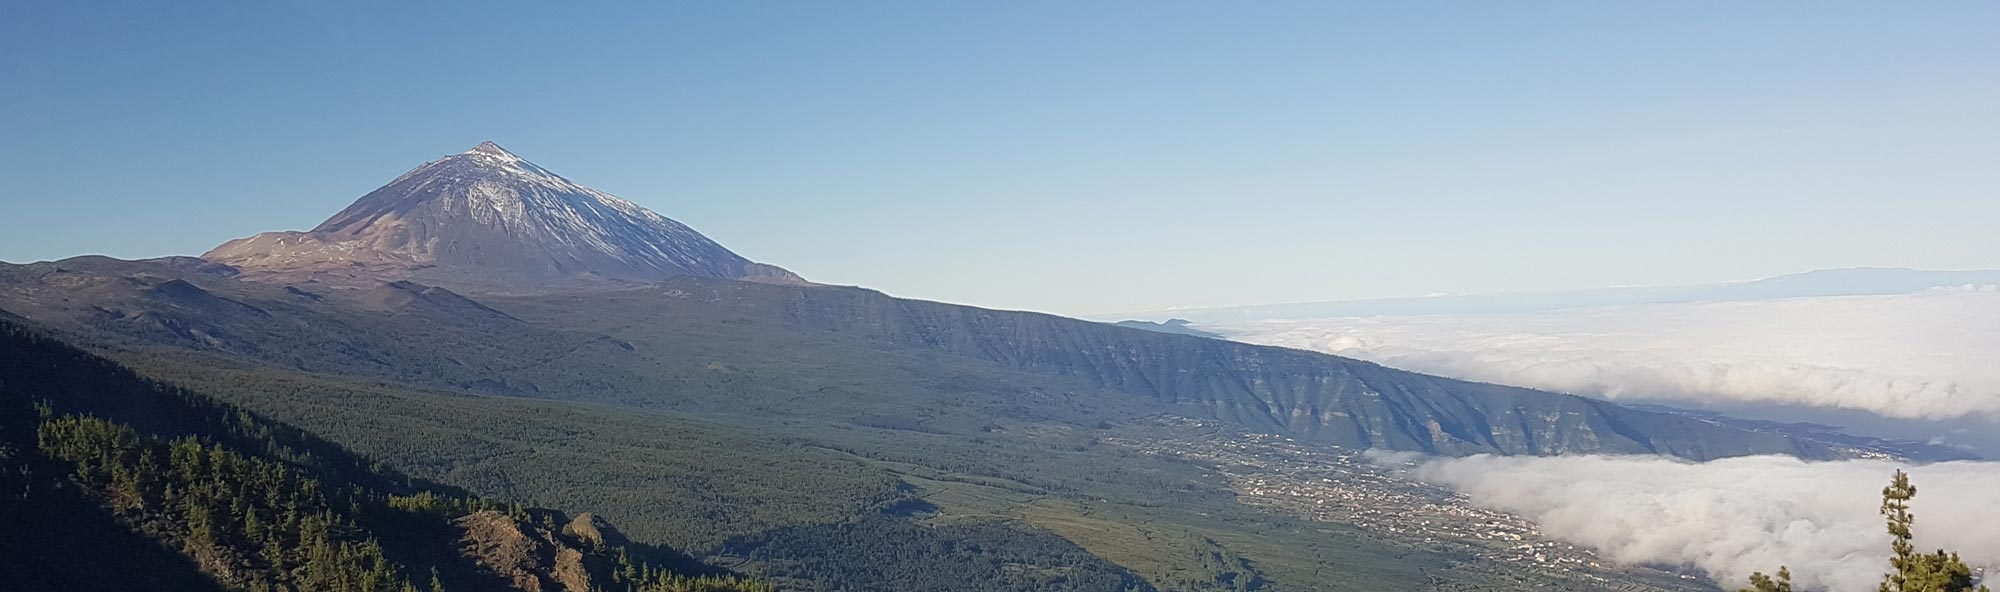 Explore Tenerife Off the Beaten Track: 3-Day Road Trip